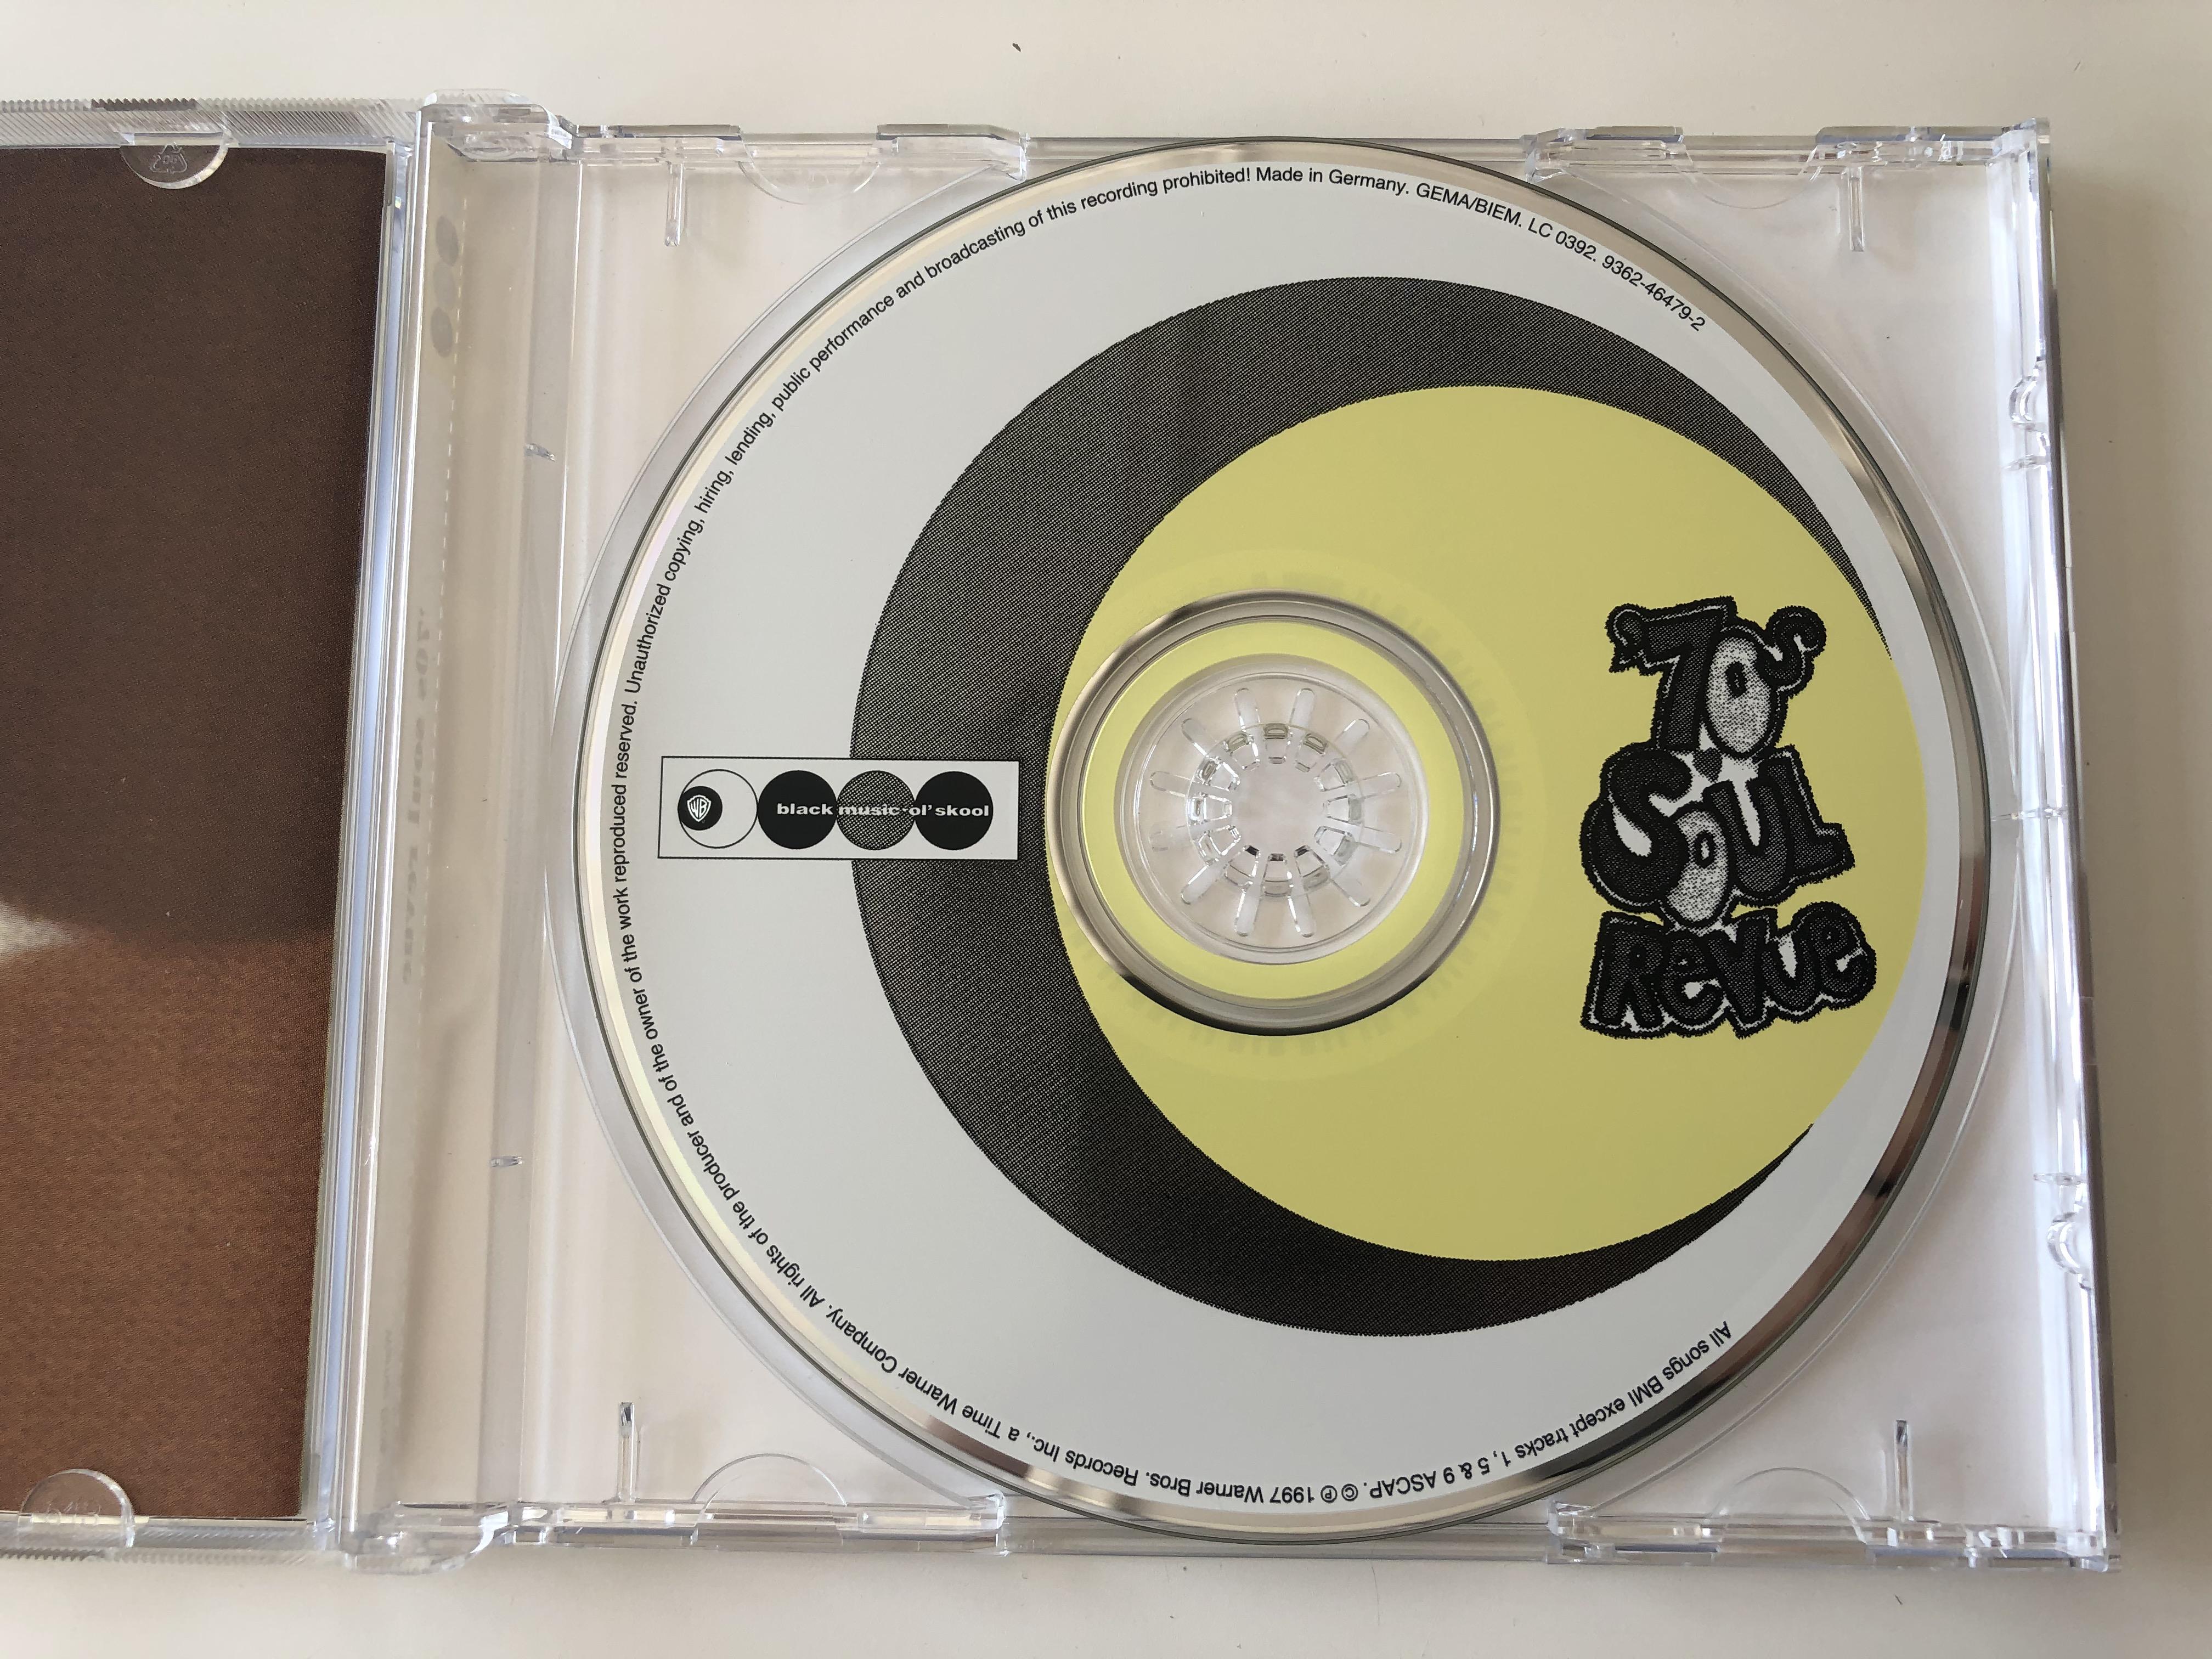 -70-s-soul-revue-warner-bros.-records-audio-cd-1997-9362-46479-2-5-.jpg